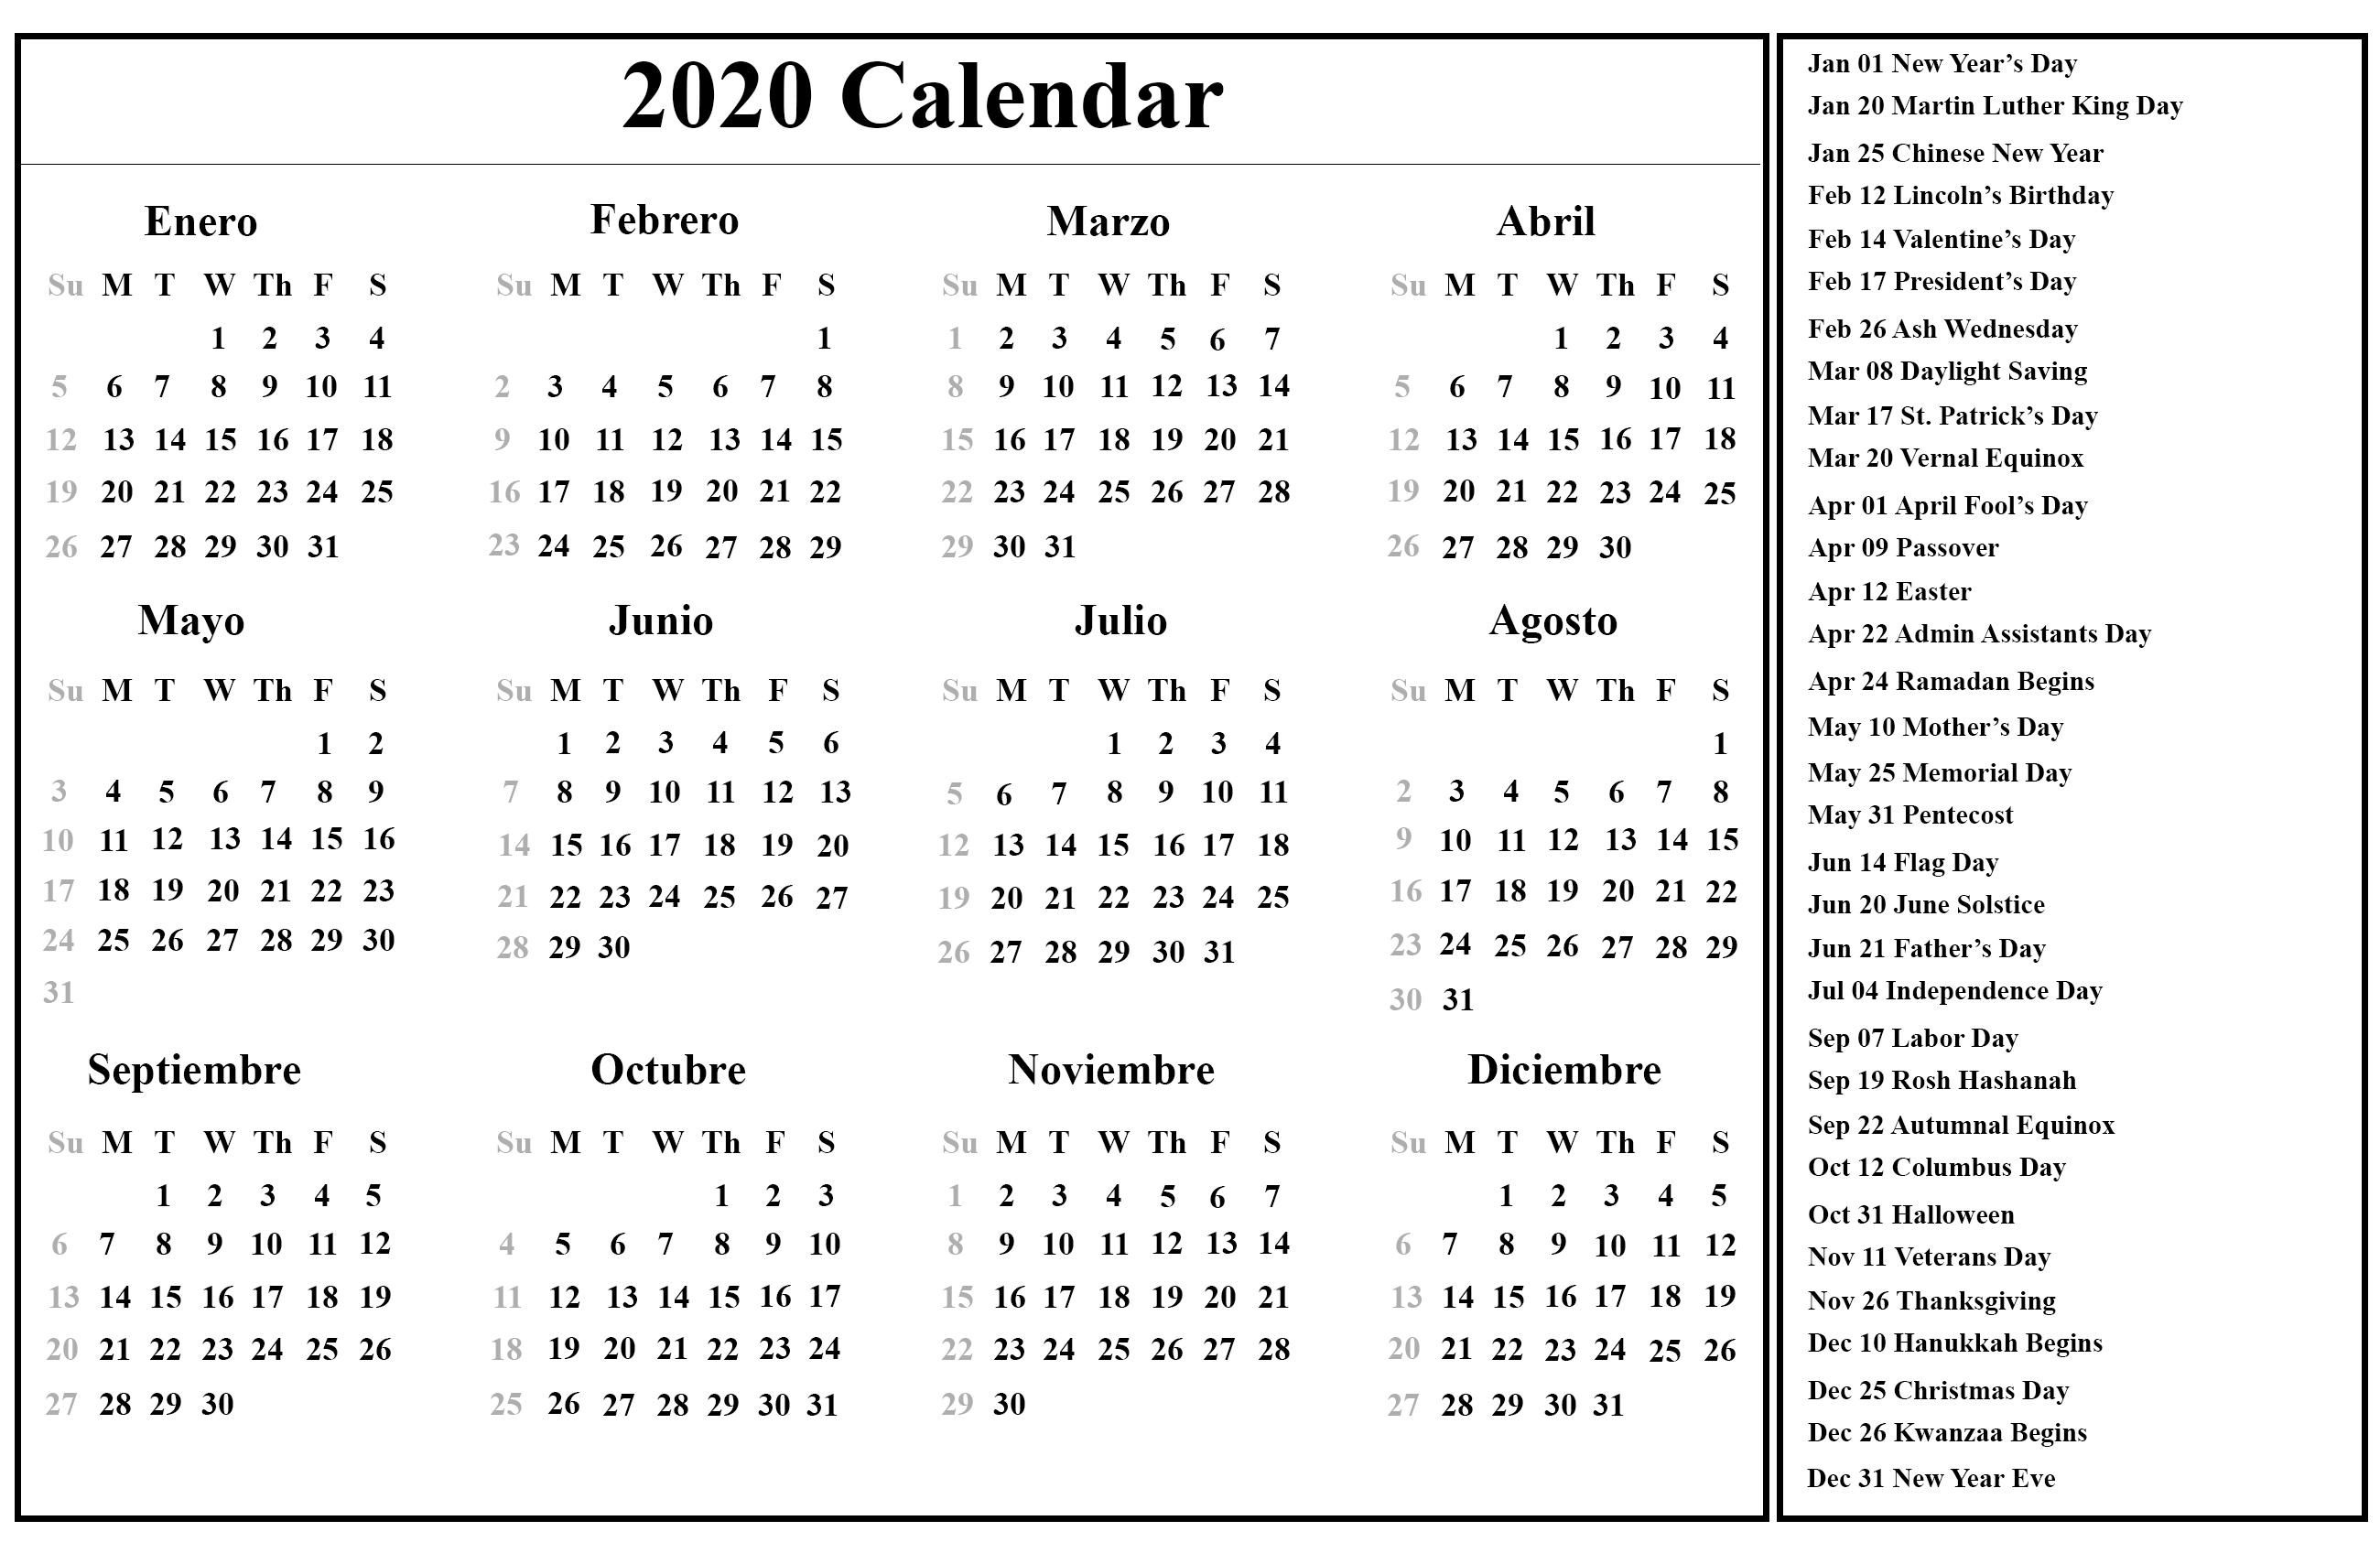 Free Printable Spanish Calendar 2020 | 2020 Calendario